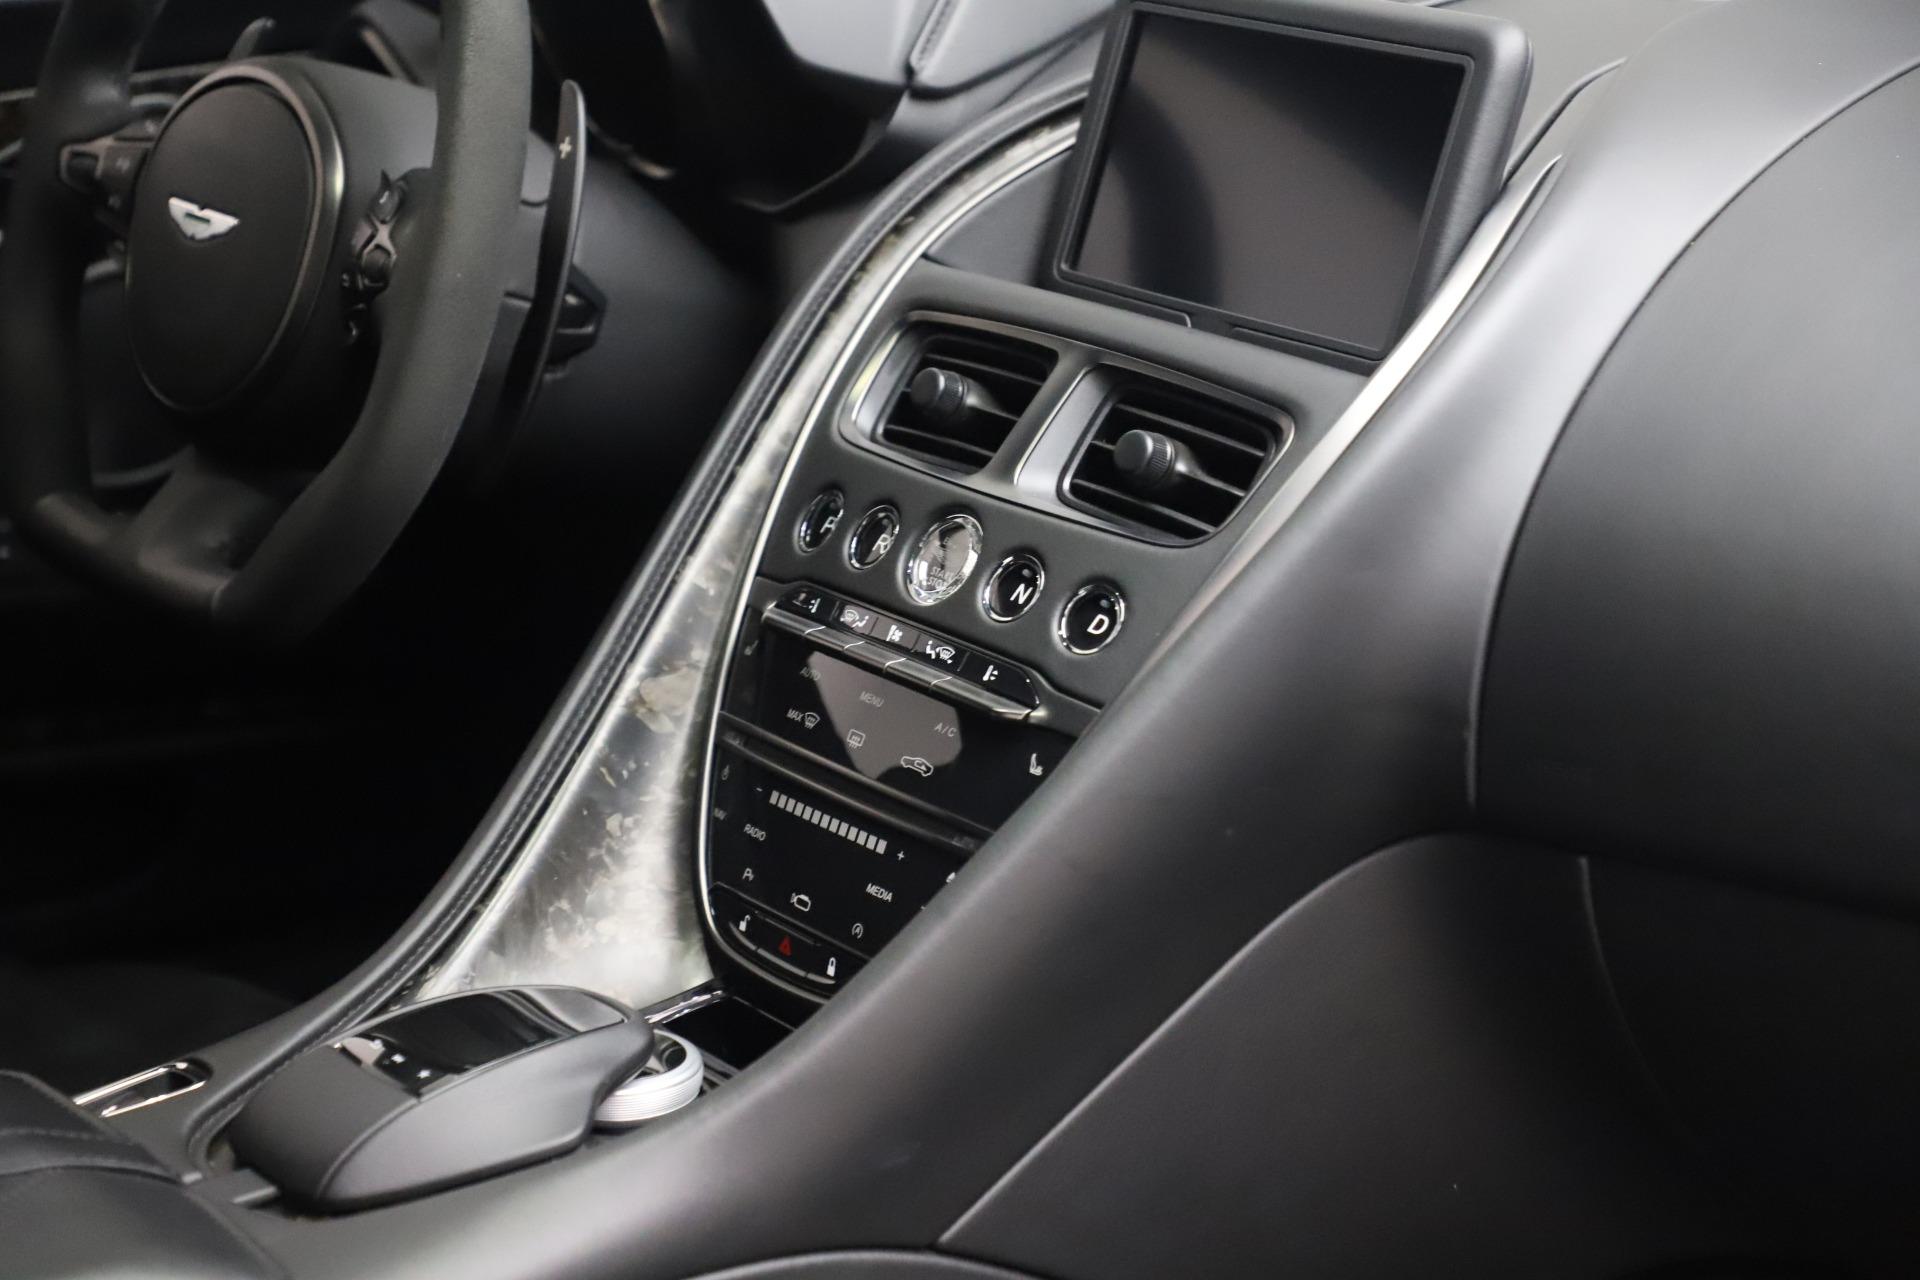 Used 2019 Aston Martin DBS Superleggera Coupe For Sale In Westport, CT 3570_p25